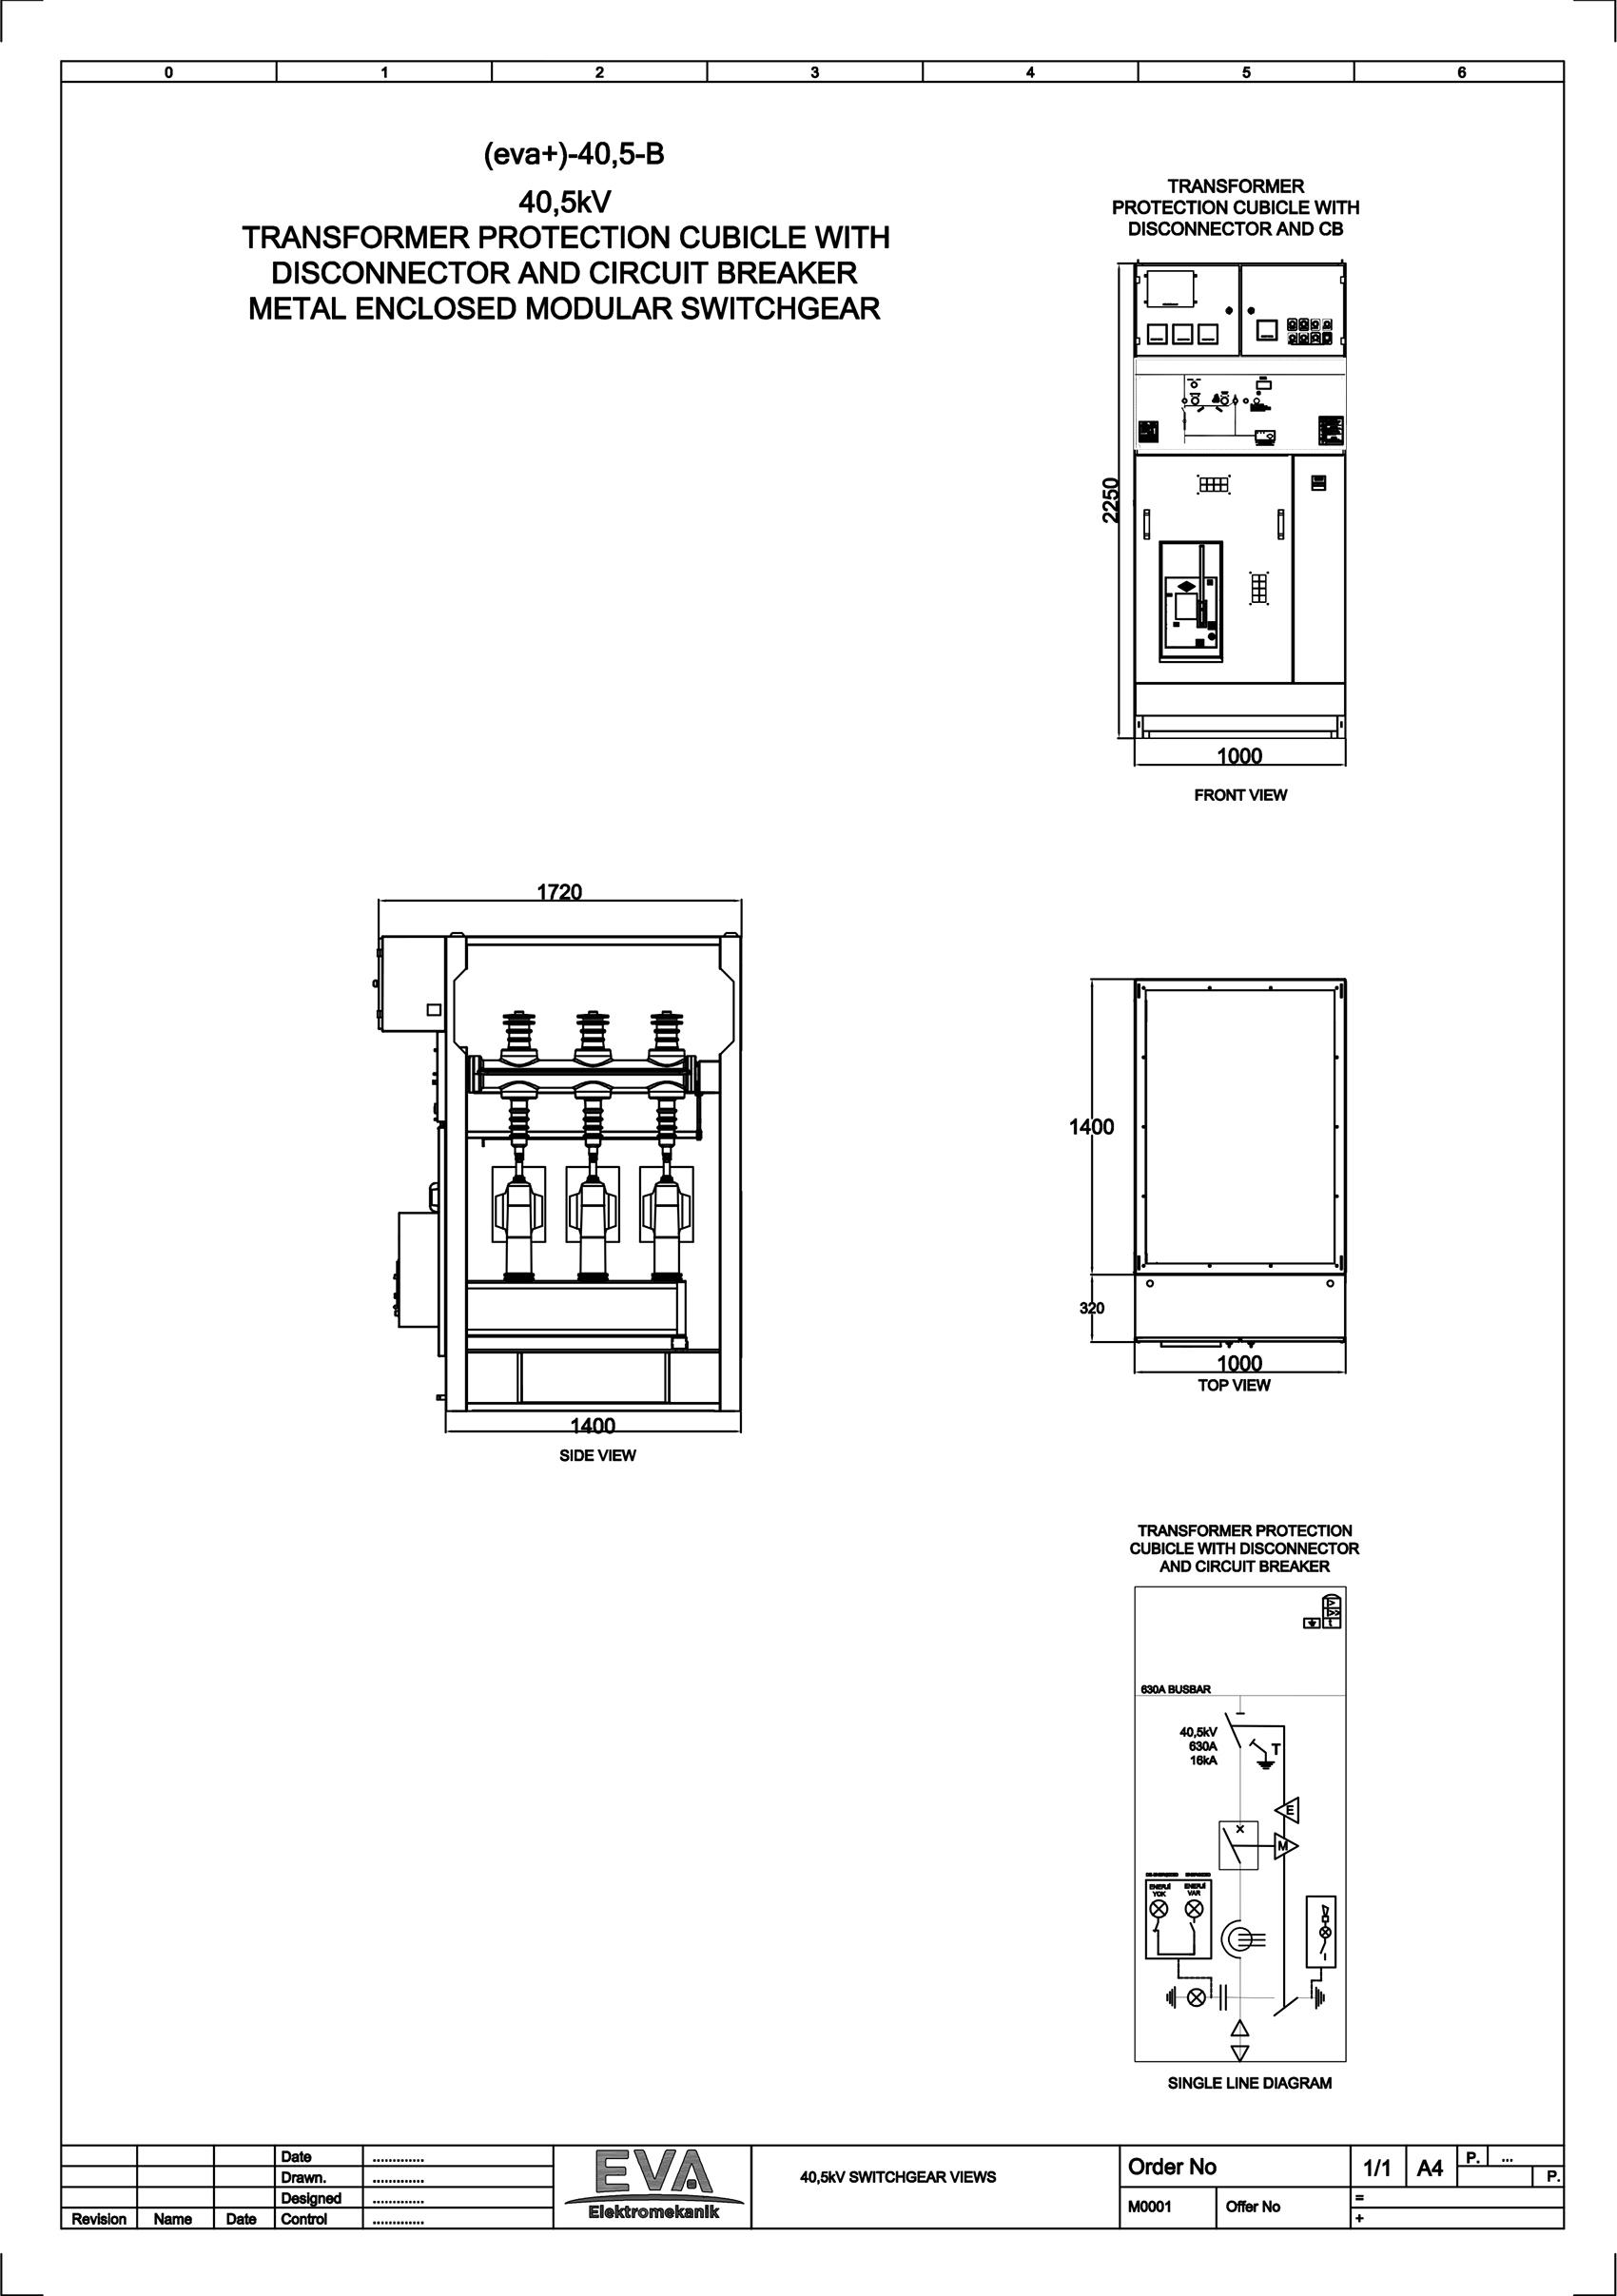 https://en.evaelektromekanik.com/wp-content/uploads/2021/03/eva405b-transformer-protection-cubicle-with-disconnector-and-circuit-breaker.jpg